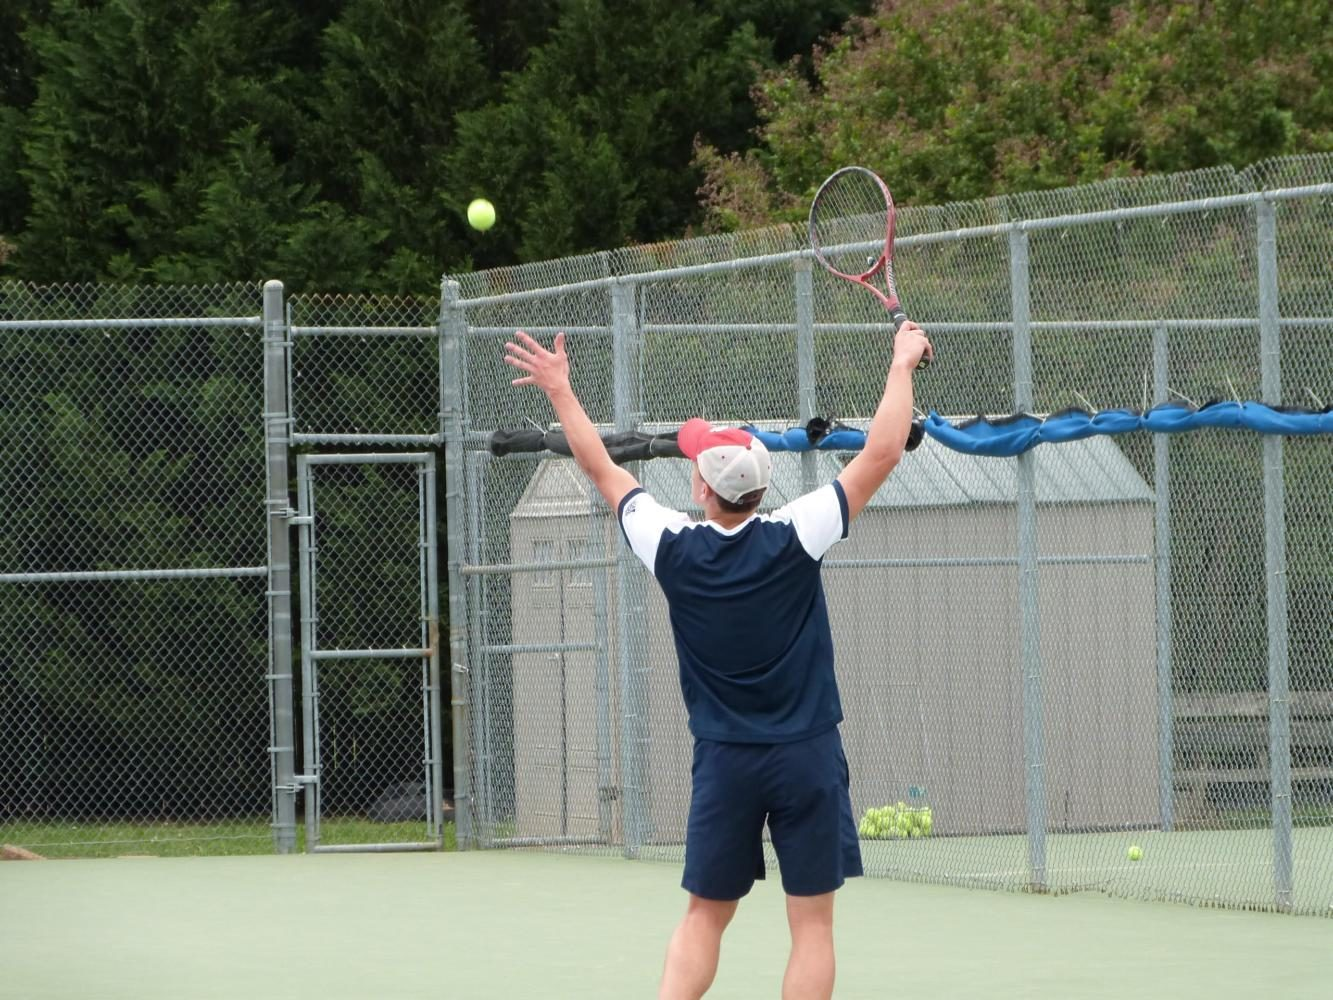 Tennis makes racket with winning season